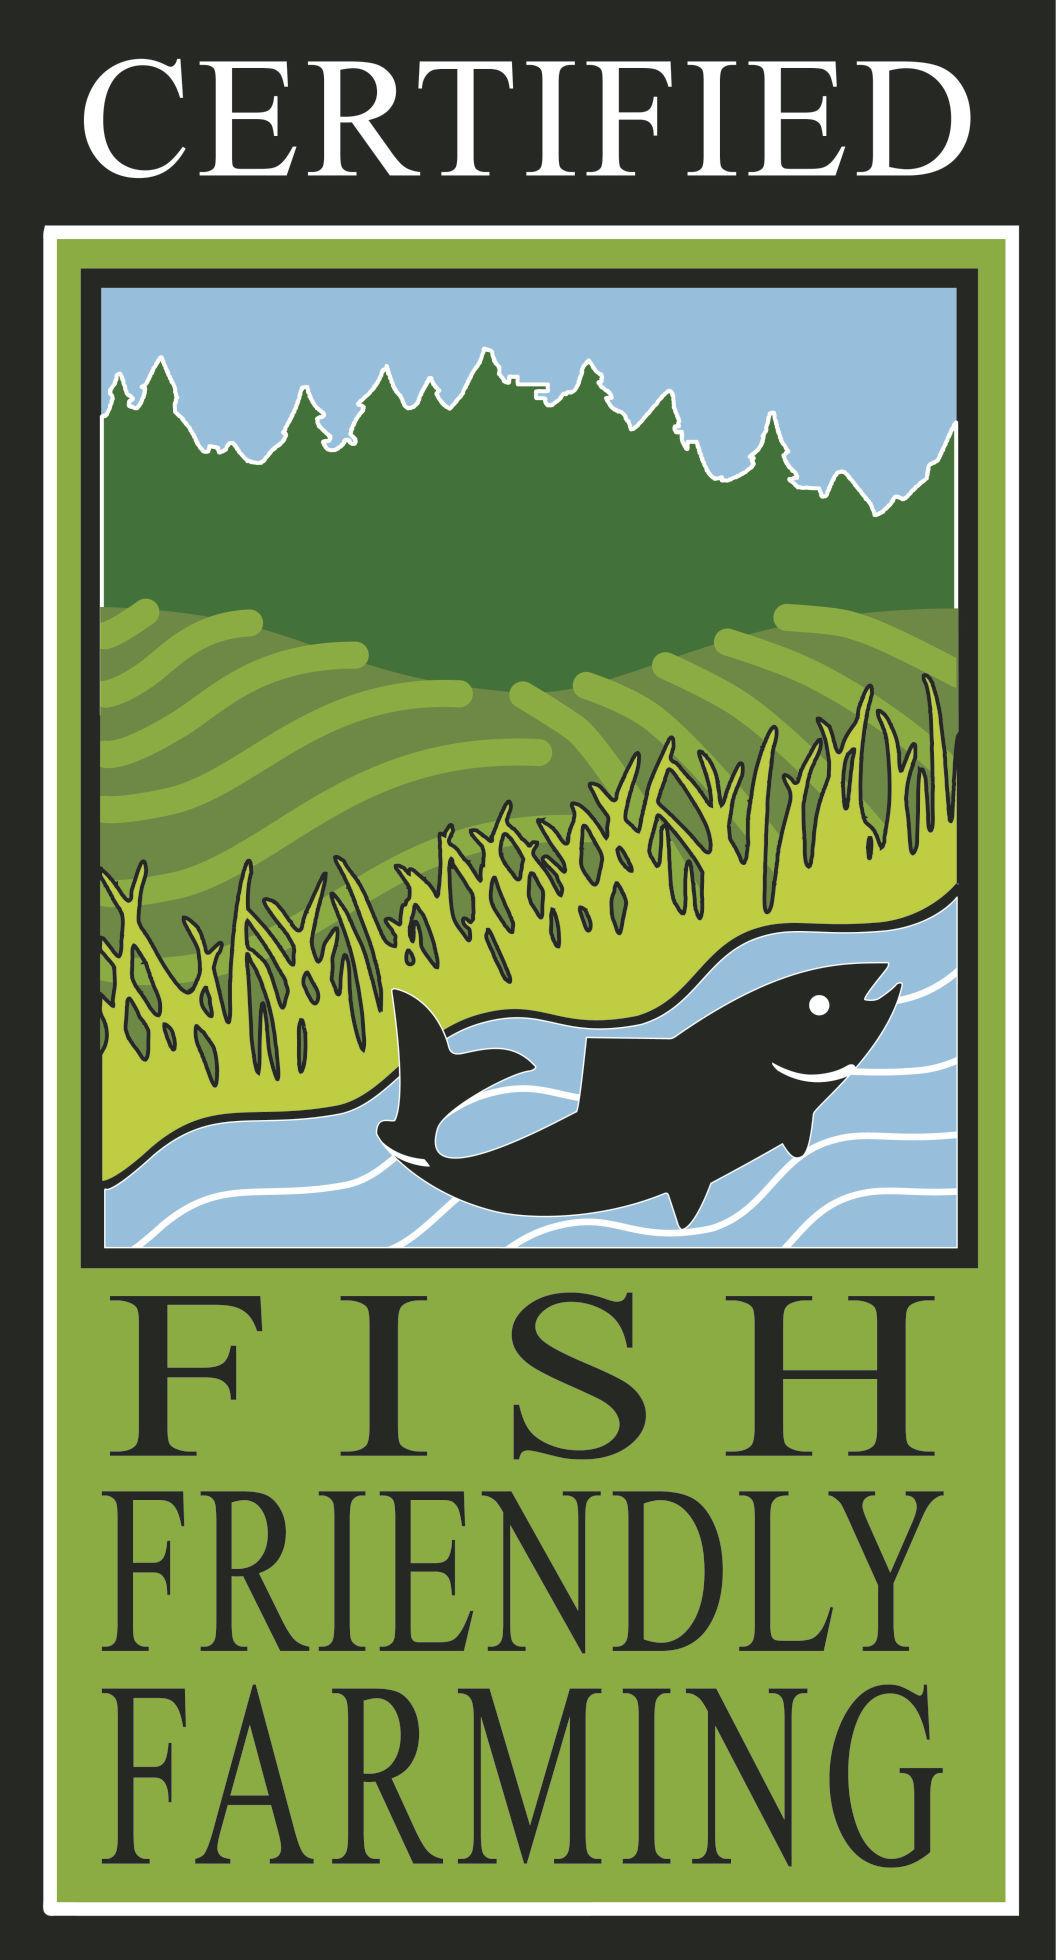 Fish Friendly Farming